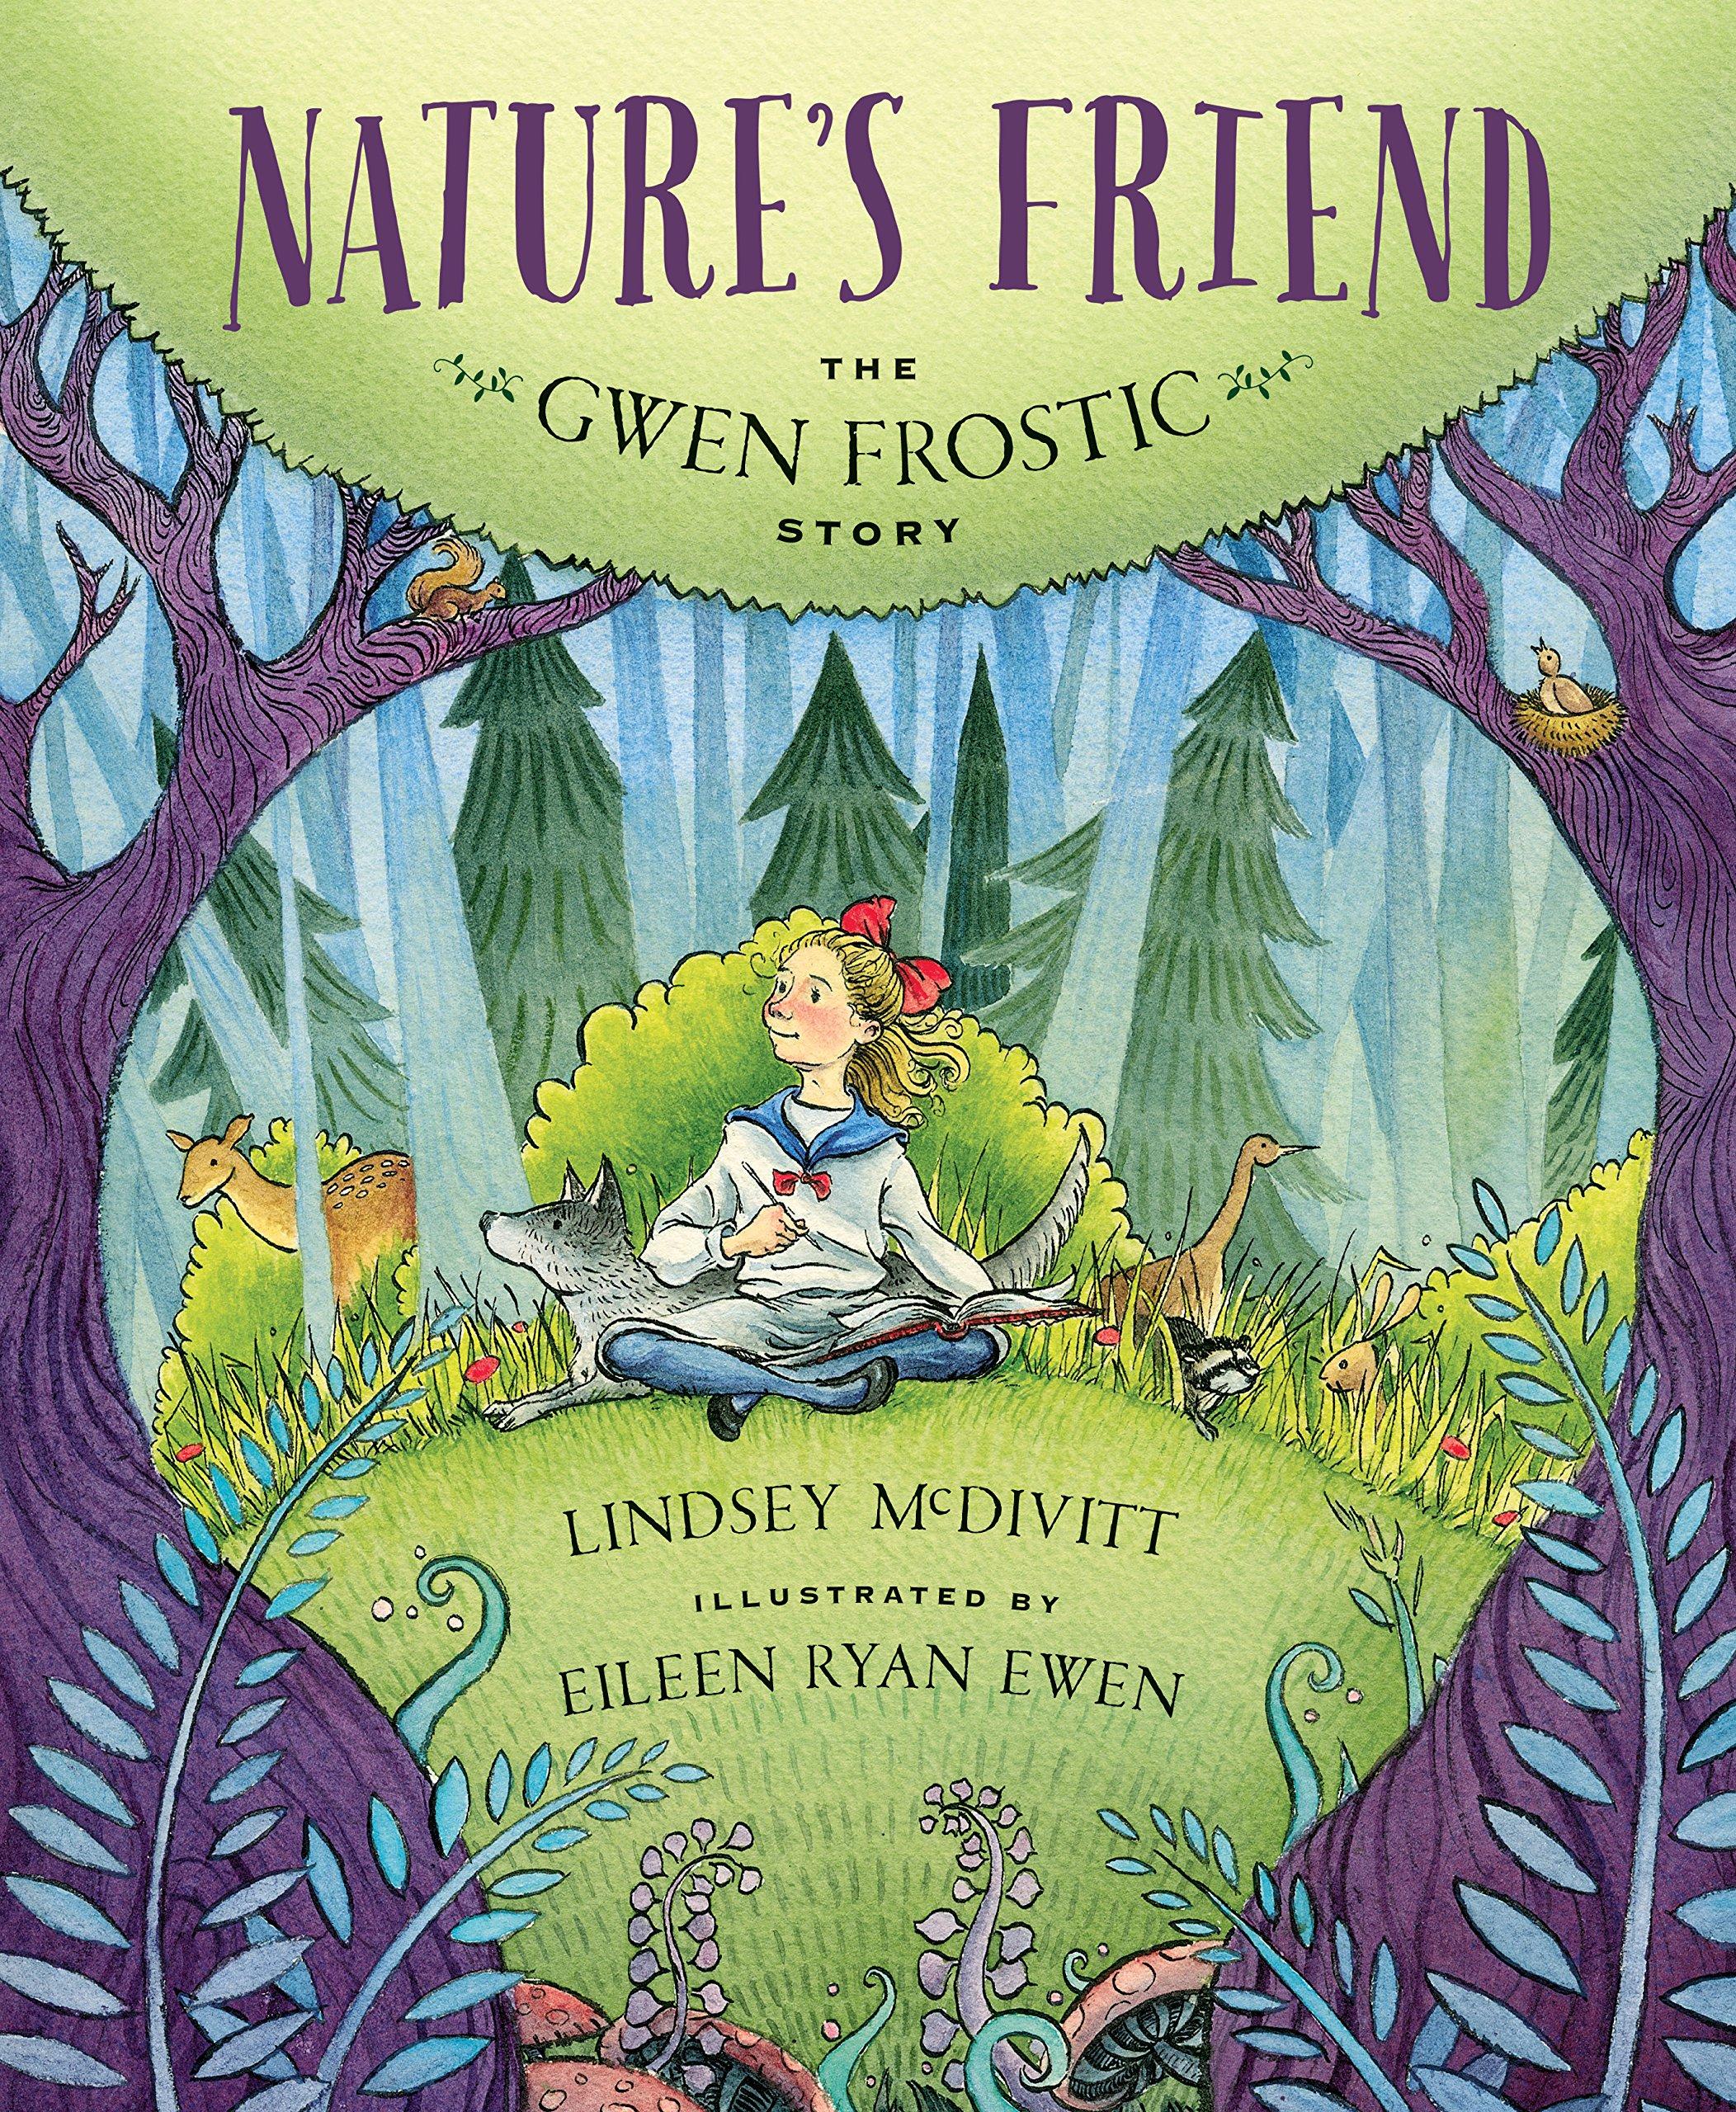 celebrate-picture-books-picture-book-review-nature's-friend-cover-2